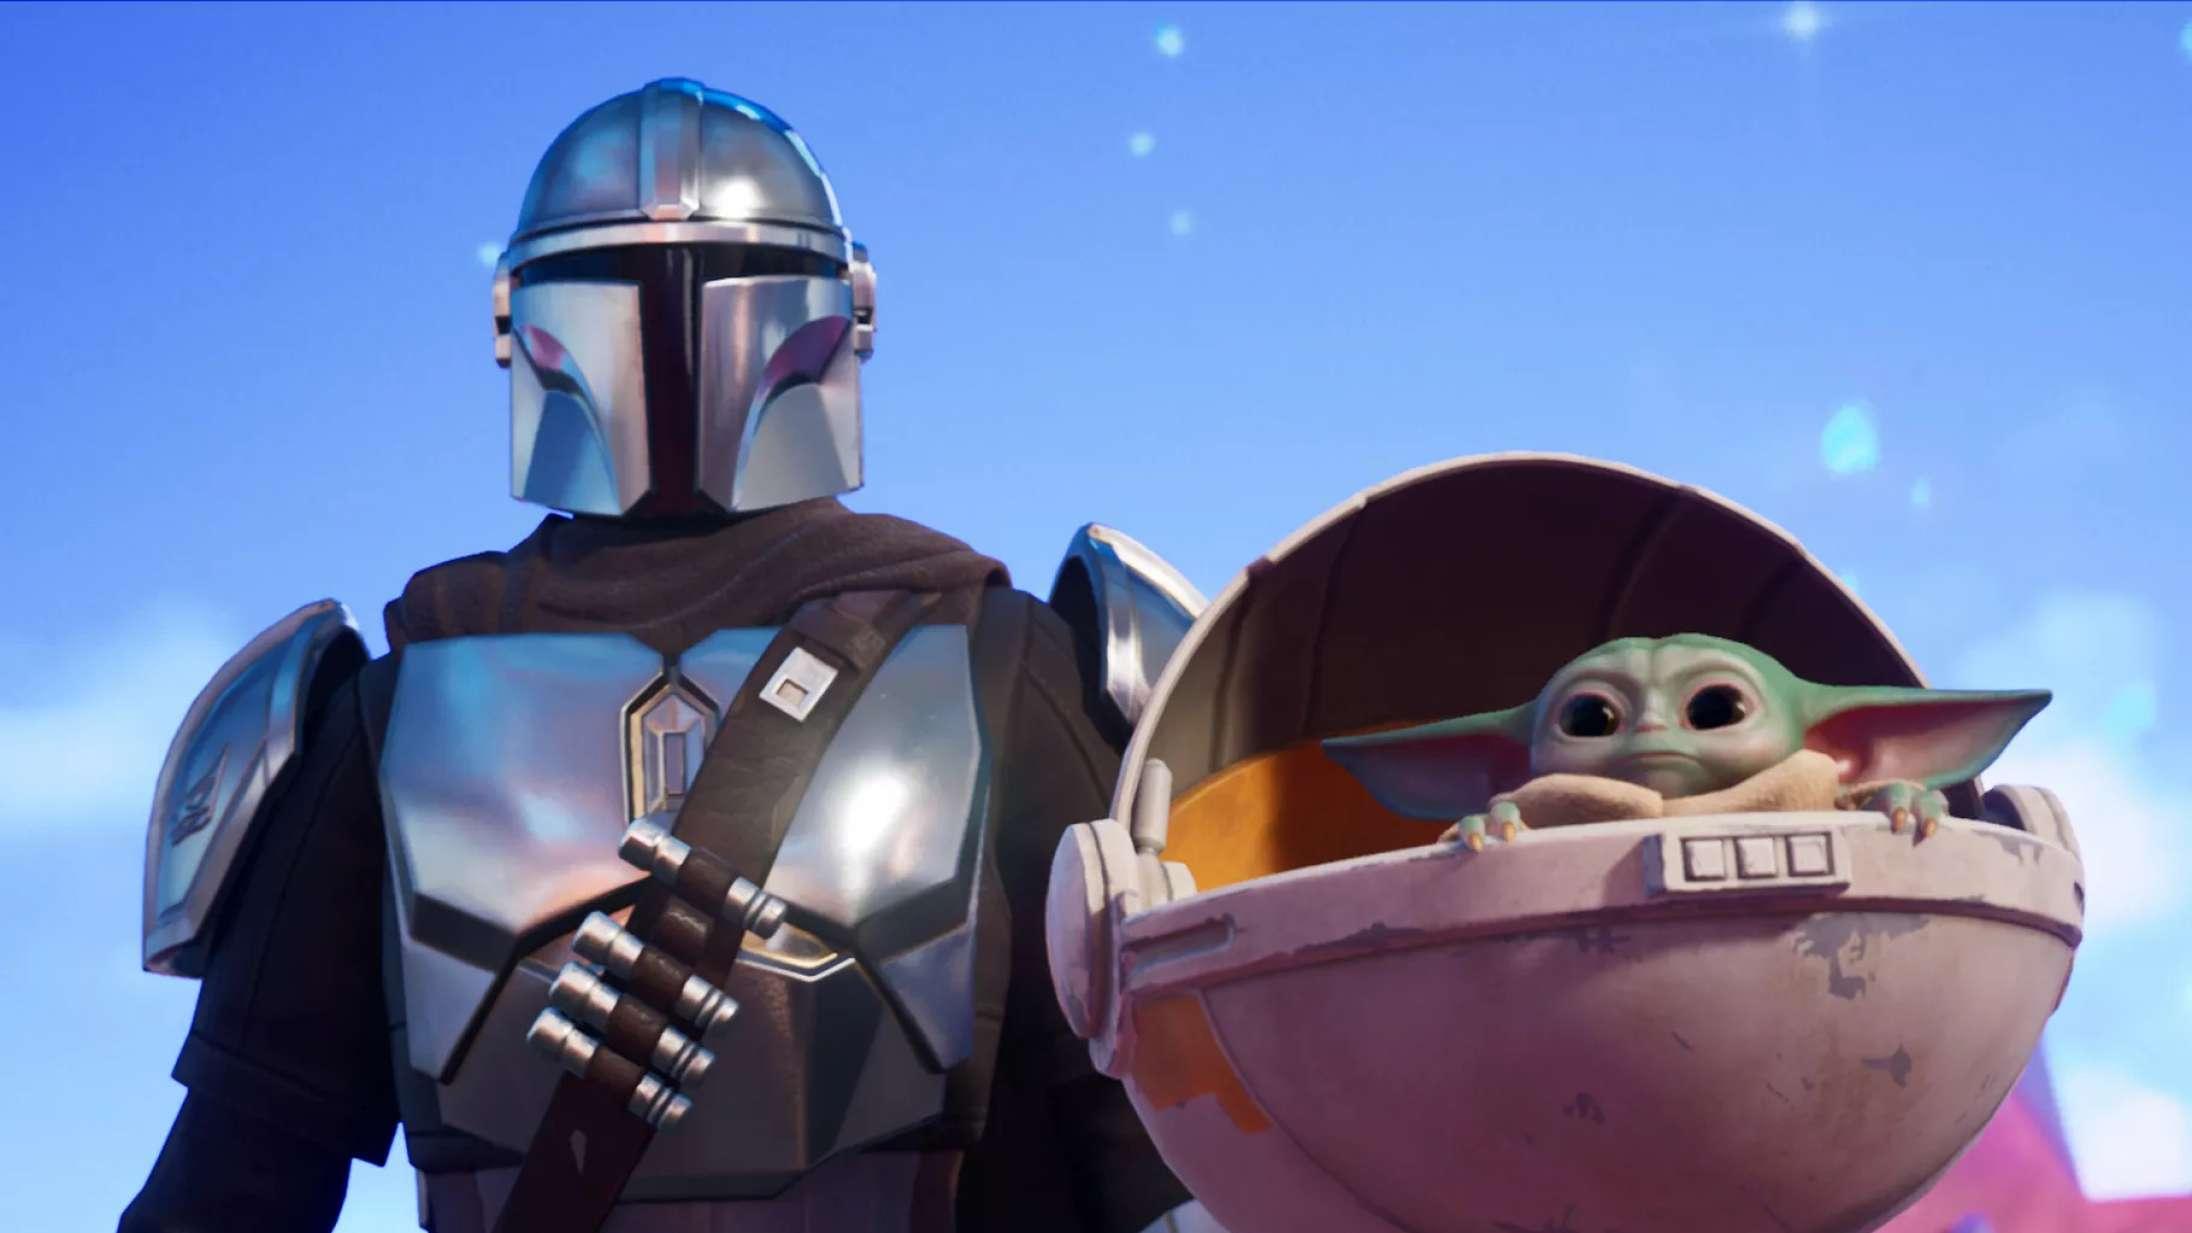 'Fortnite'-finale smadrer rekord – ny sæson starter med Baby Yoda og 'The Mandalorian'